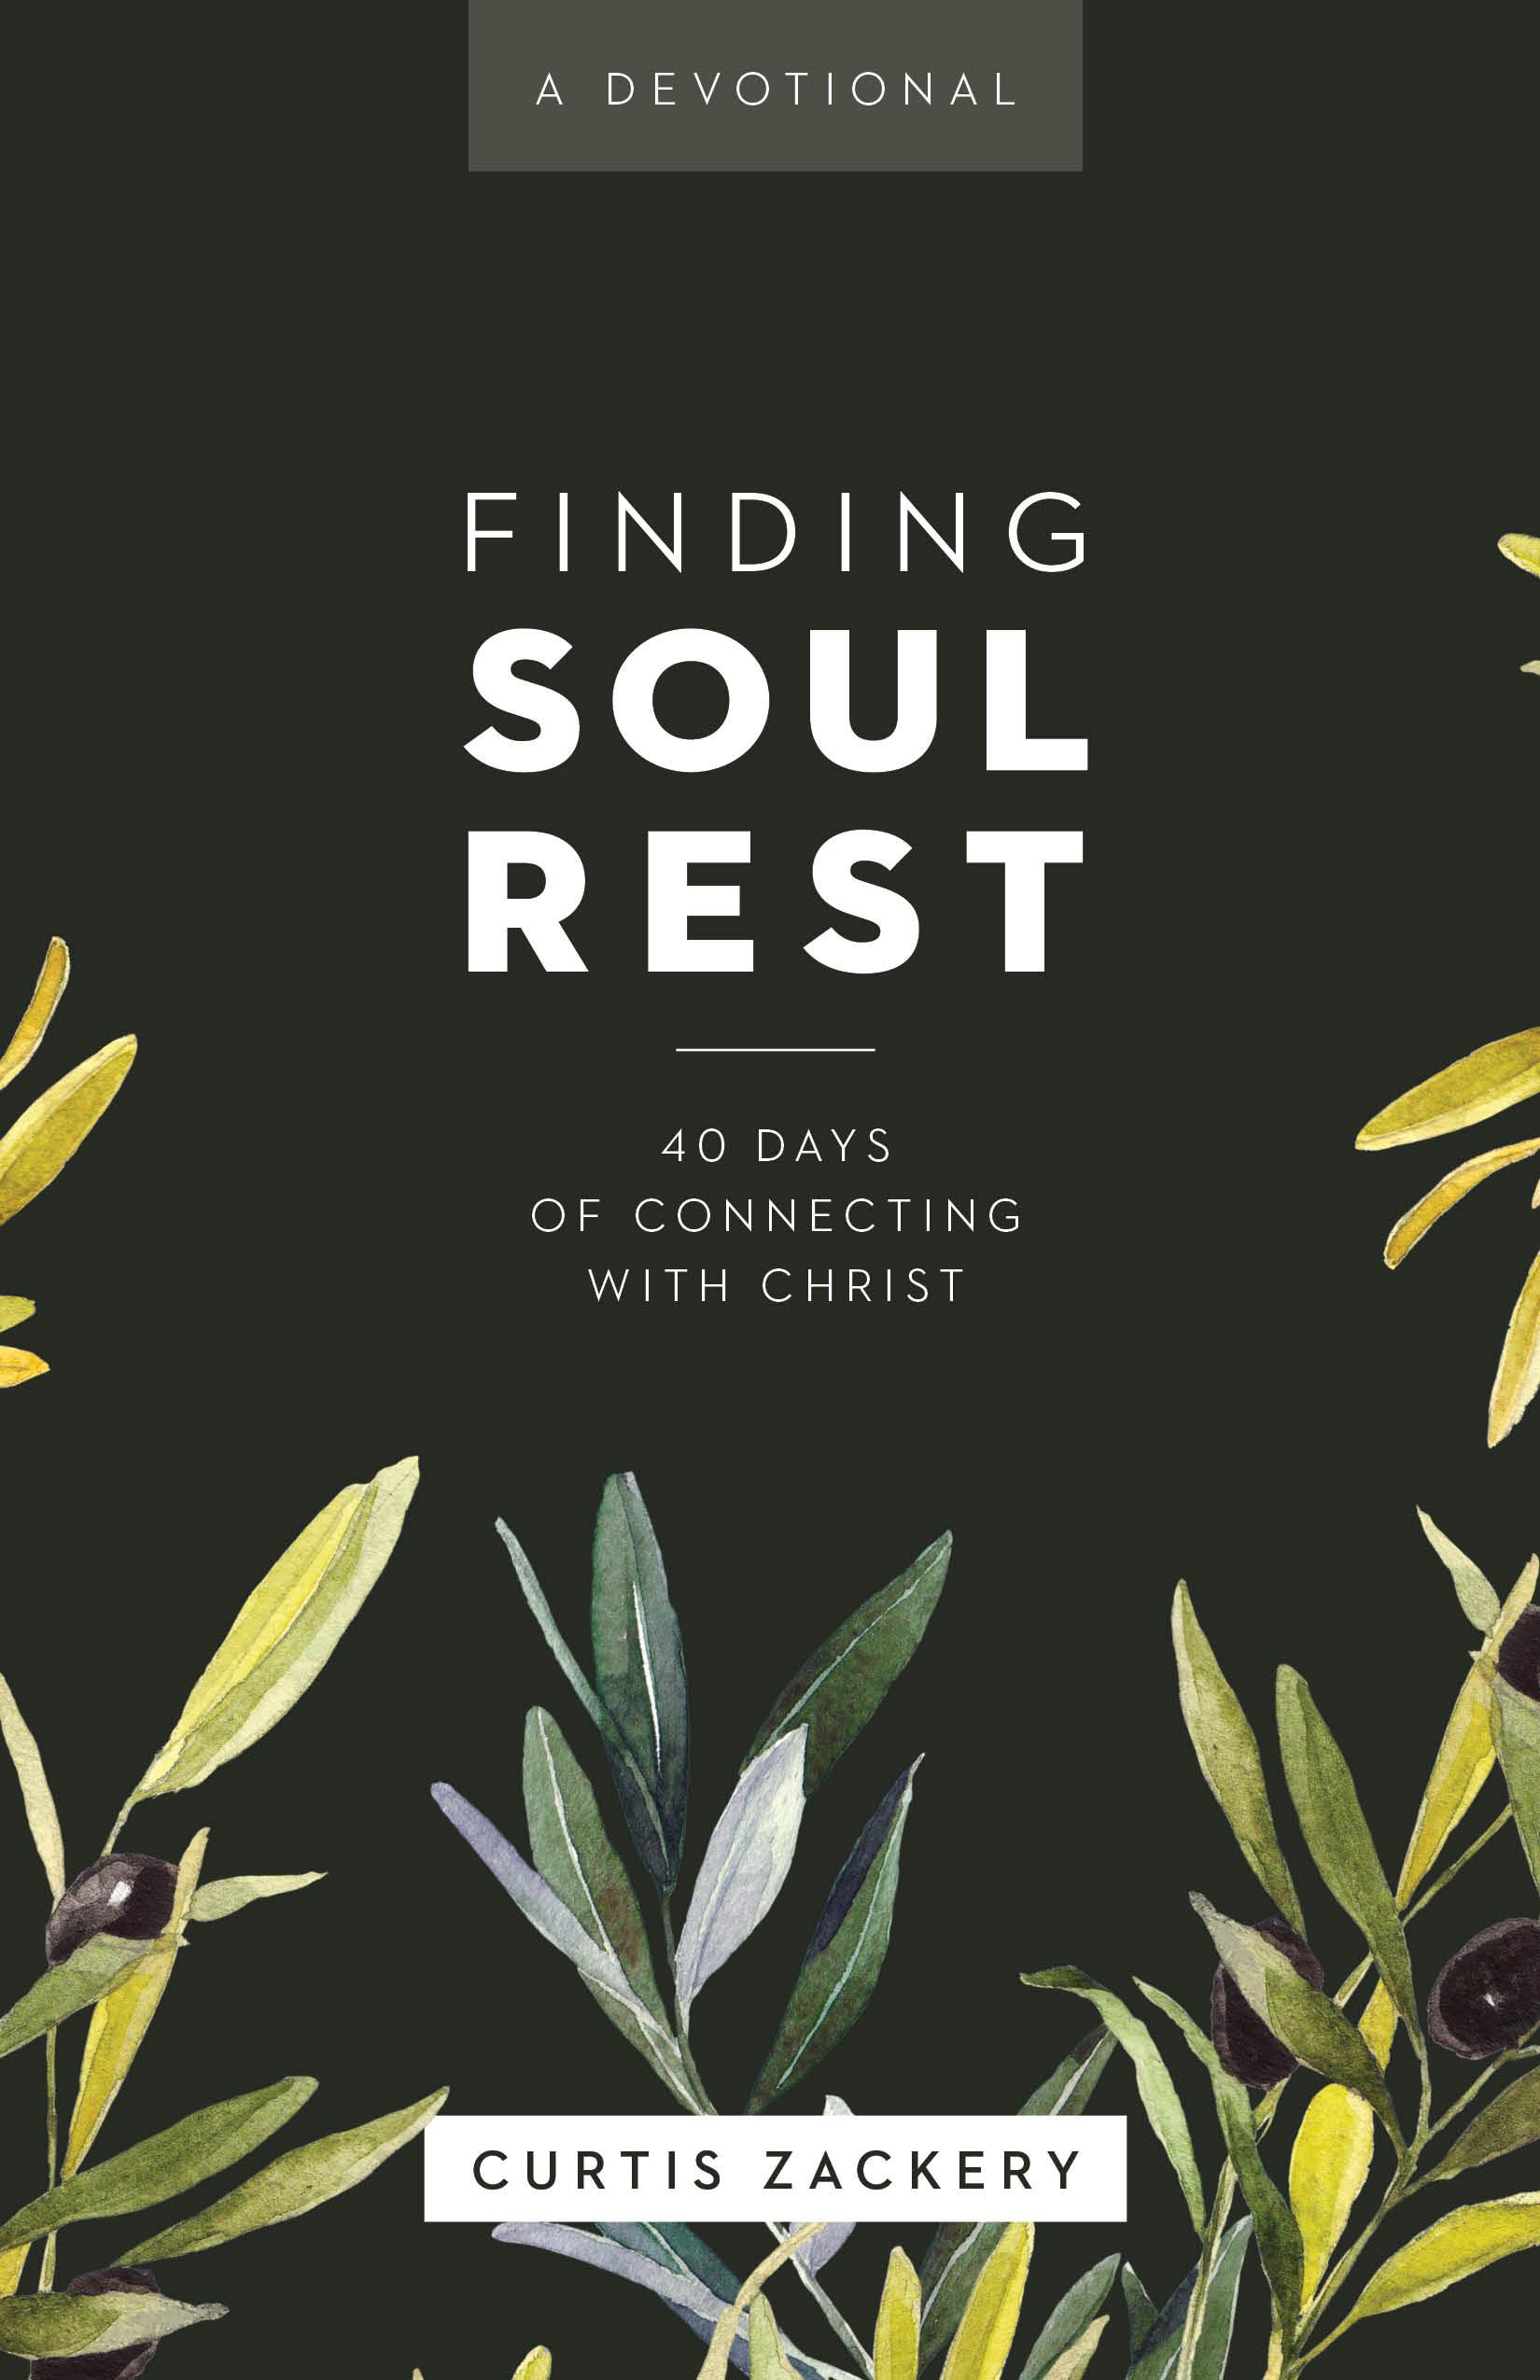 Finding Soul Rest